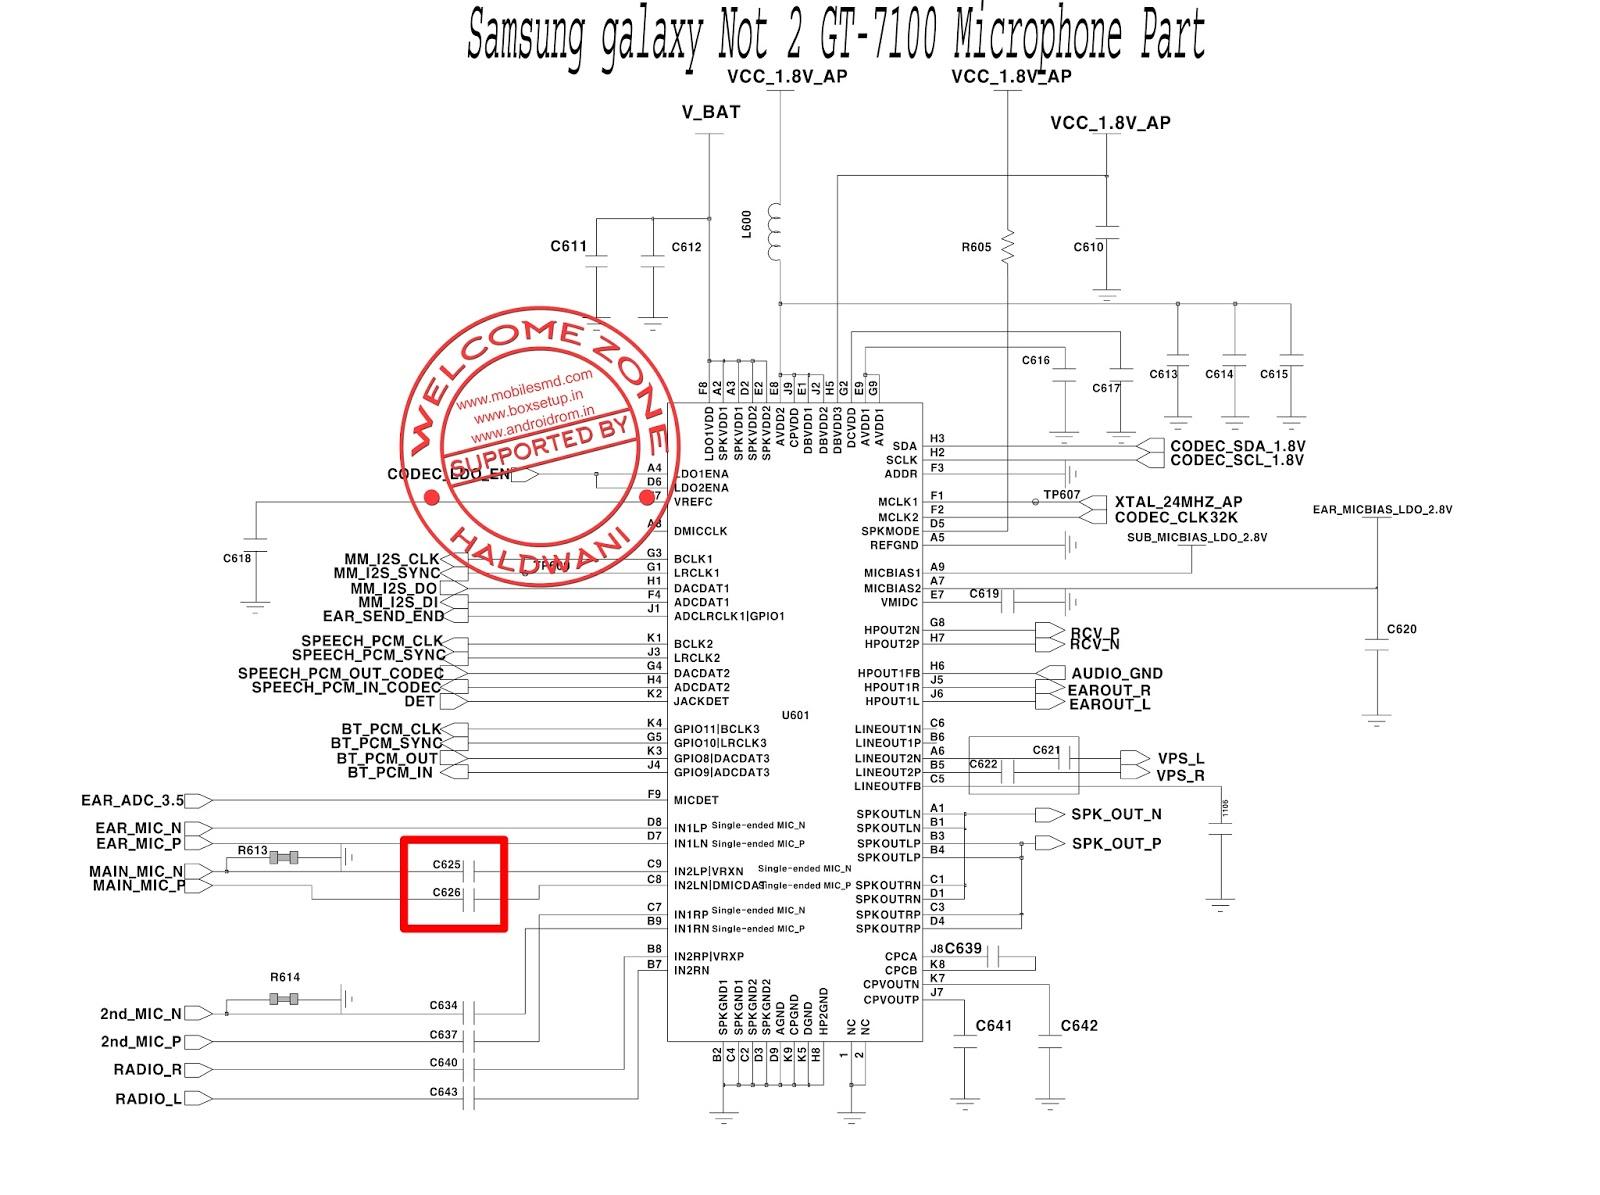 Samsung Galaxy Not 2 Gt 7100 Microphone Part Main Mic